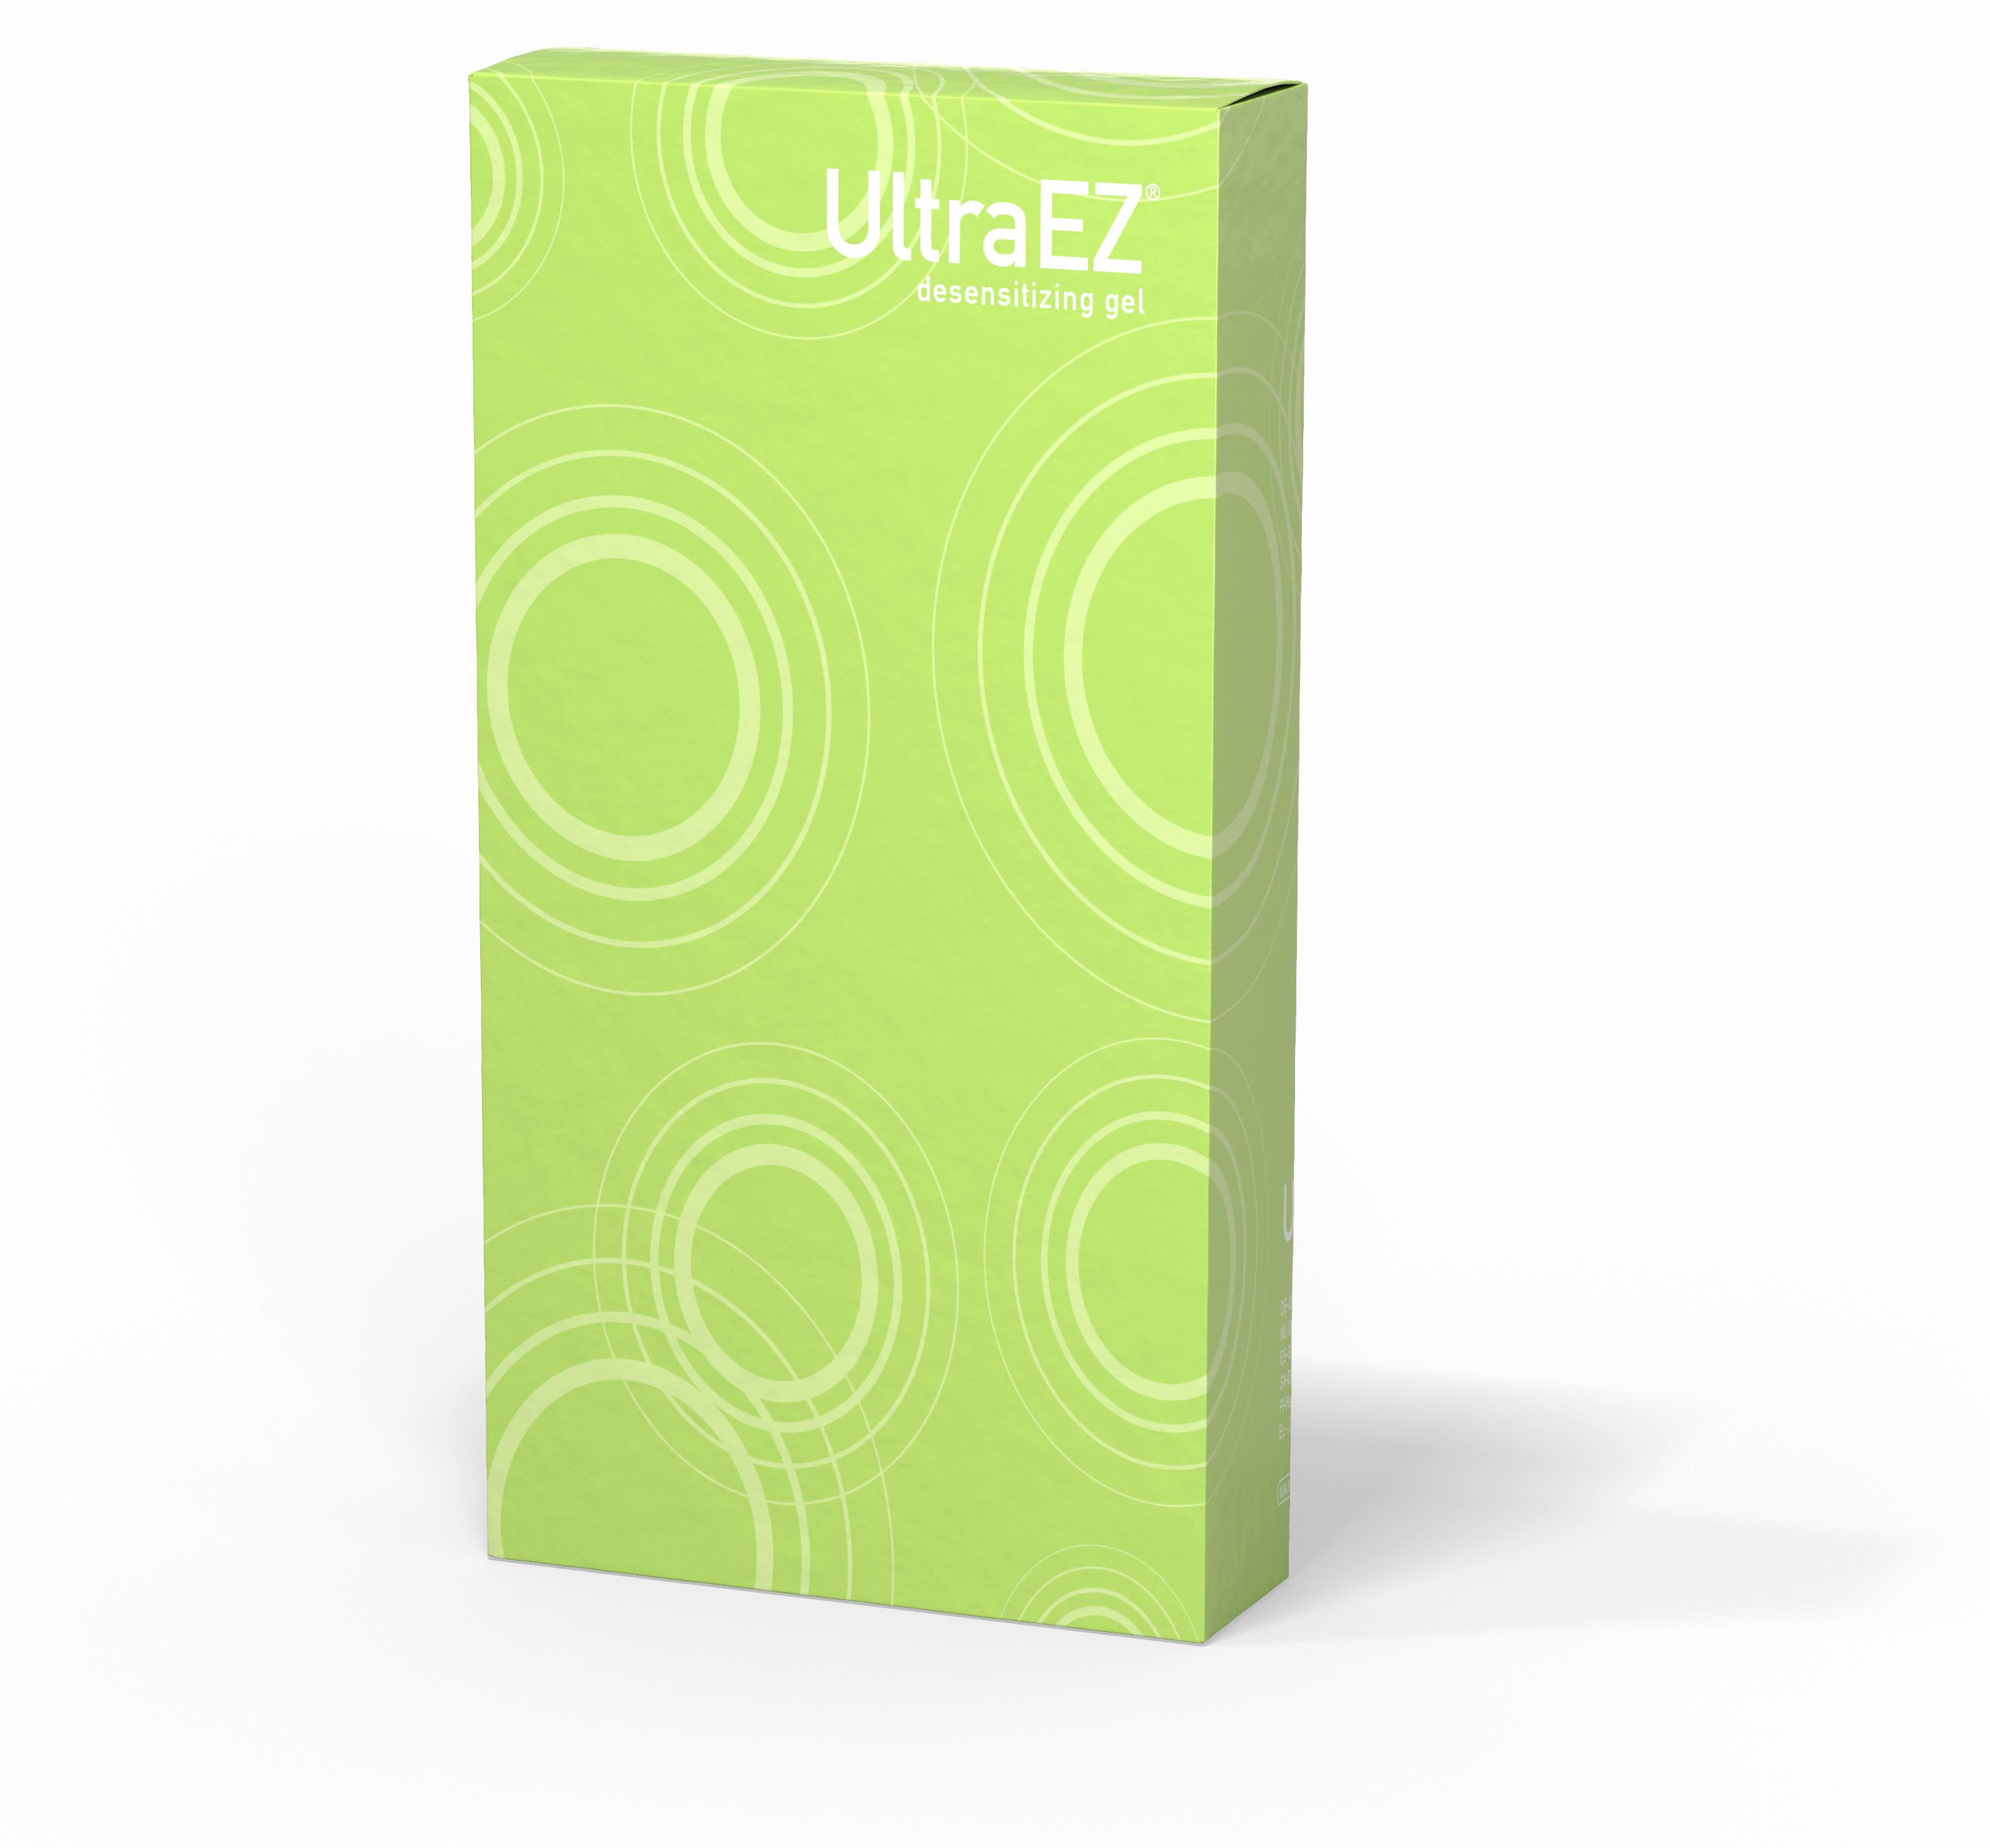 UltraEZ Box 3D.jpg